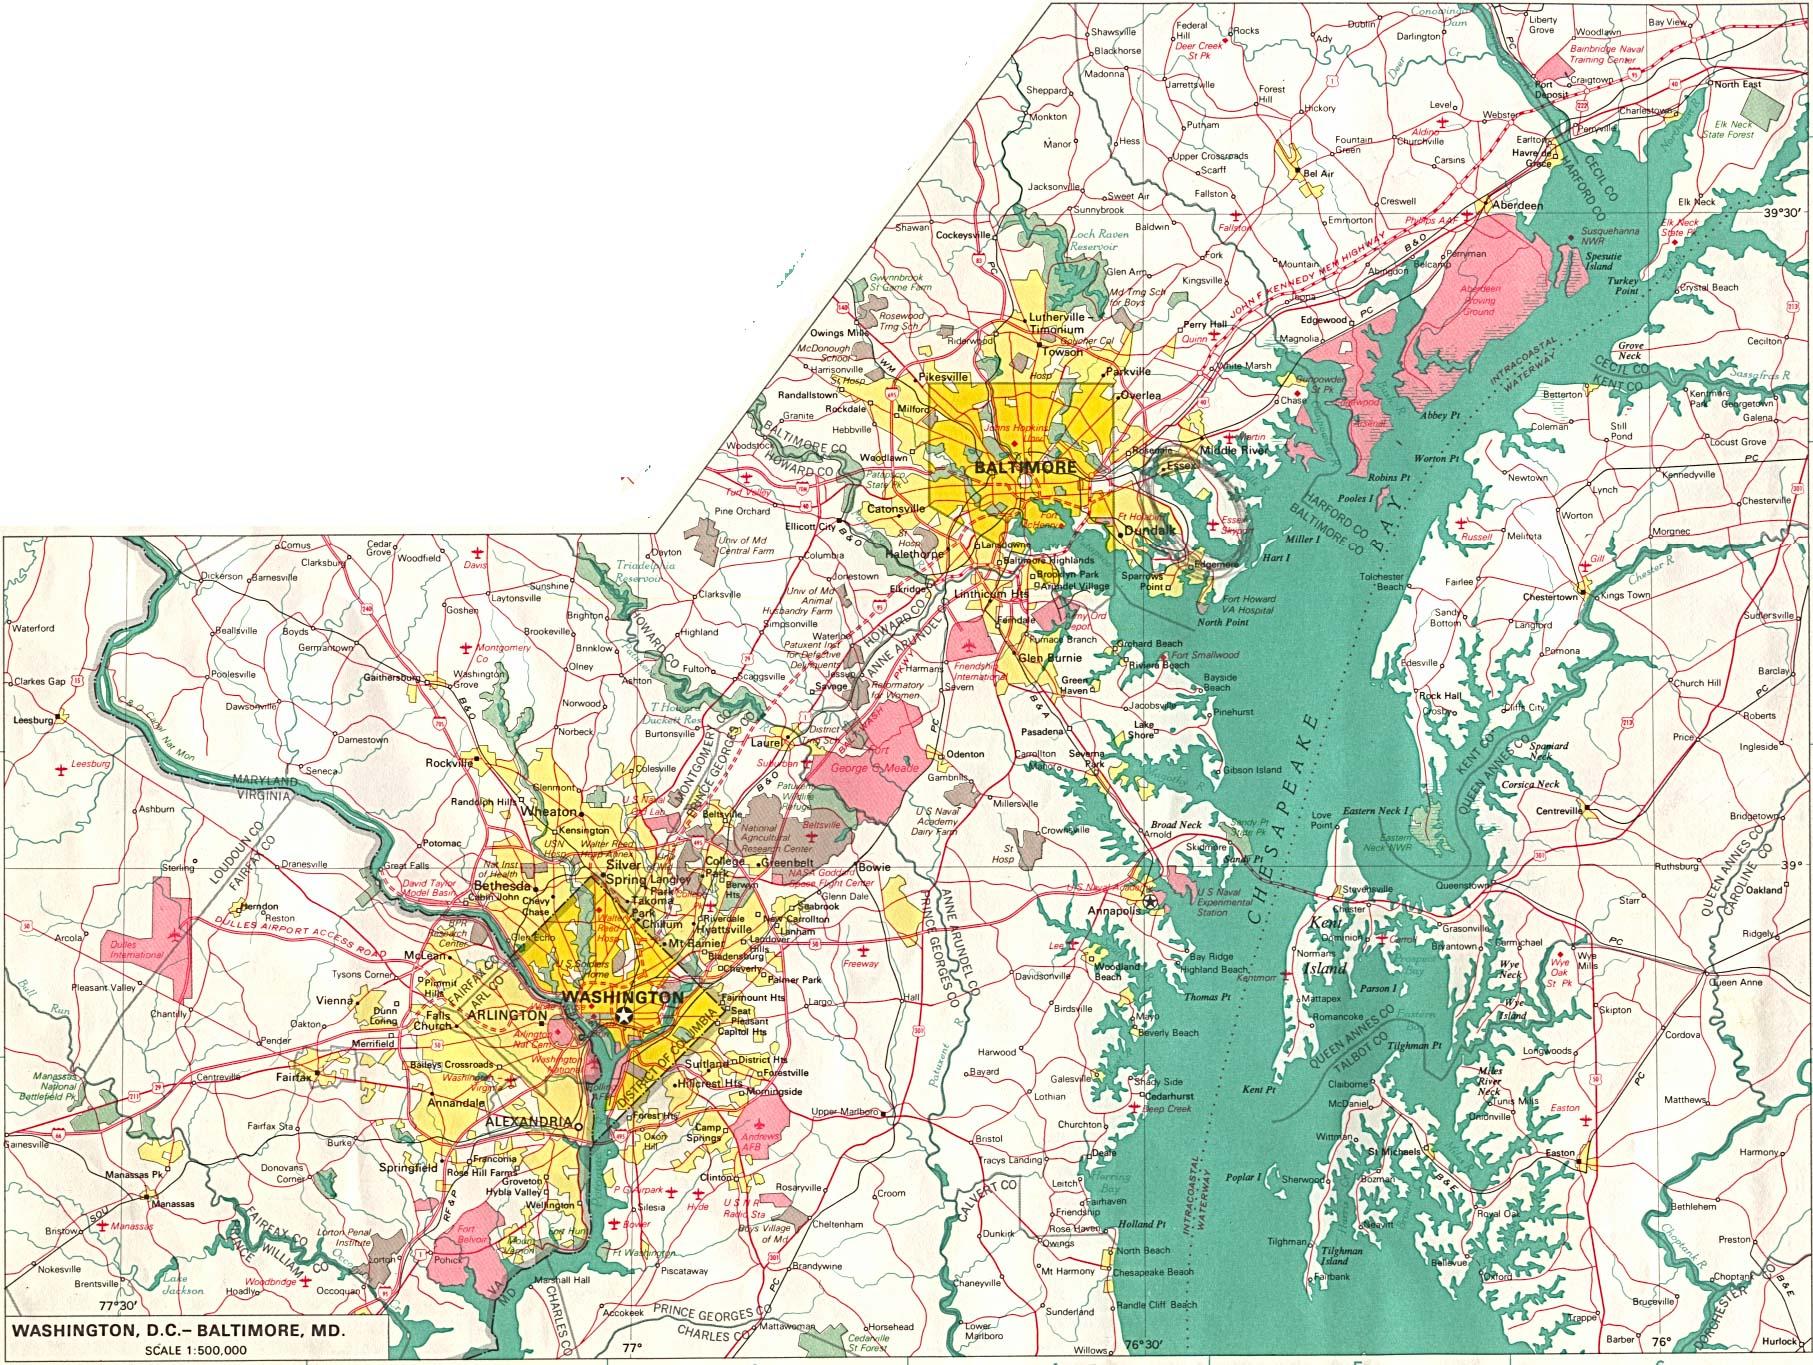 Reisenett World City Maps - Tunisia cities small scale map